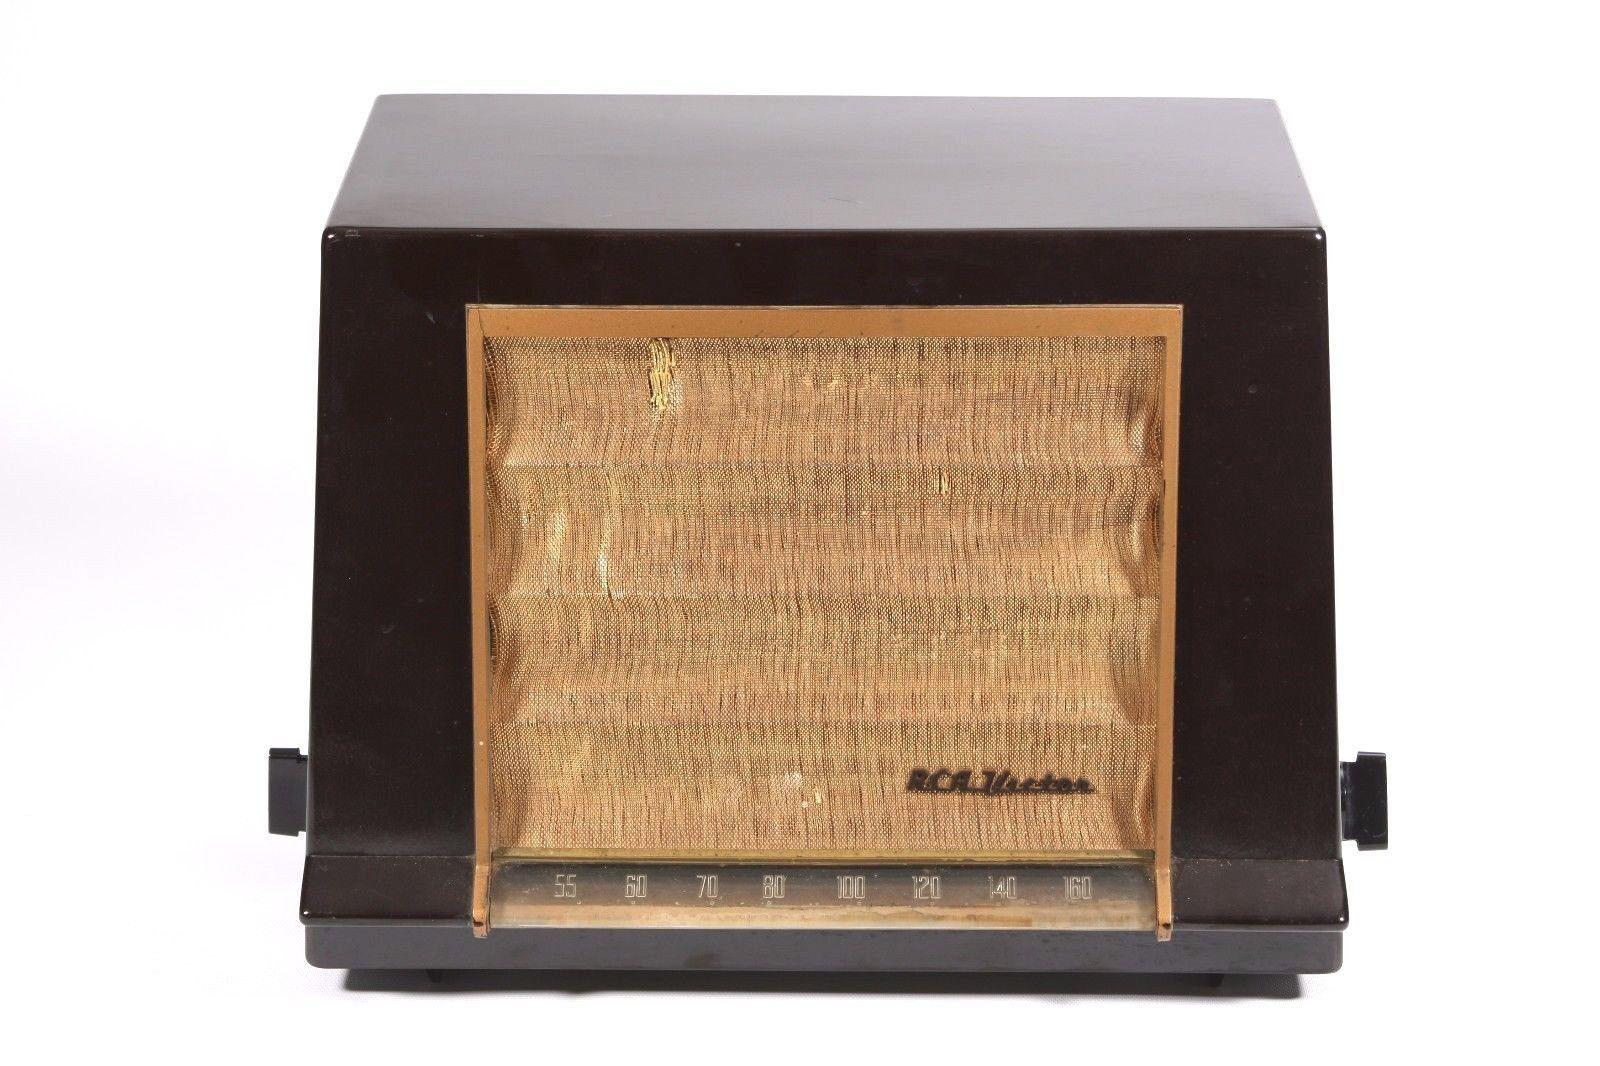 RCA Victor Tube Radio Model 1-X-591 and 48 similar items